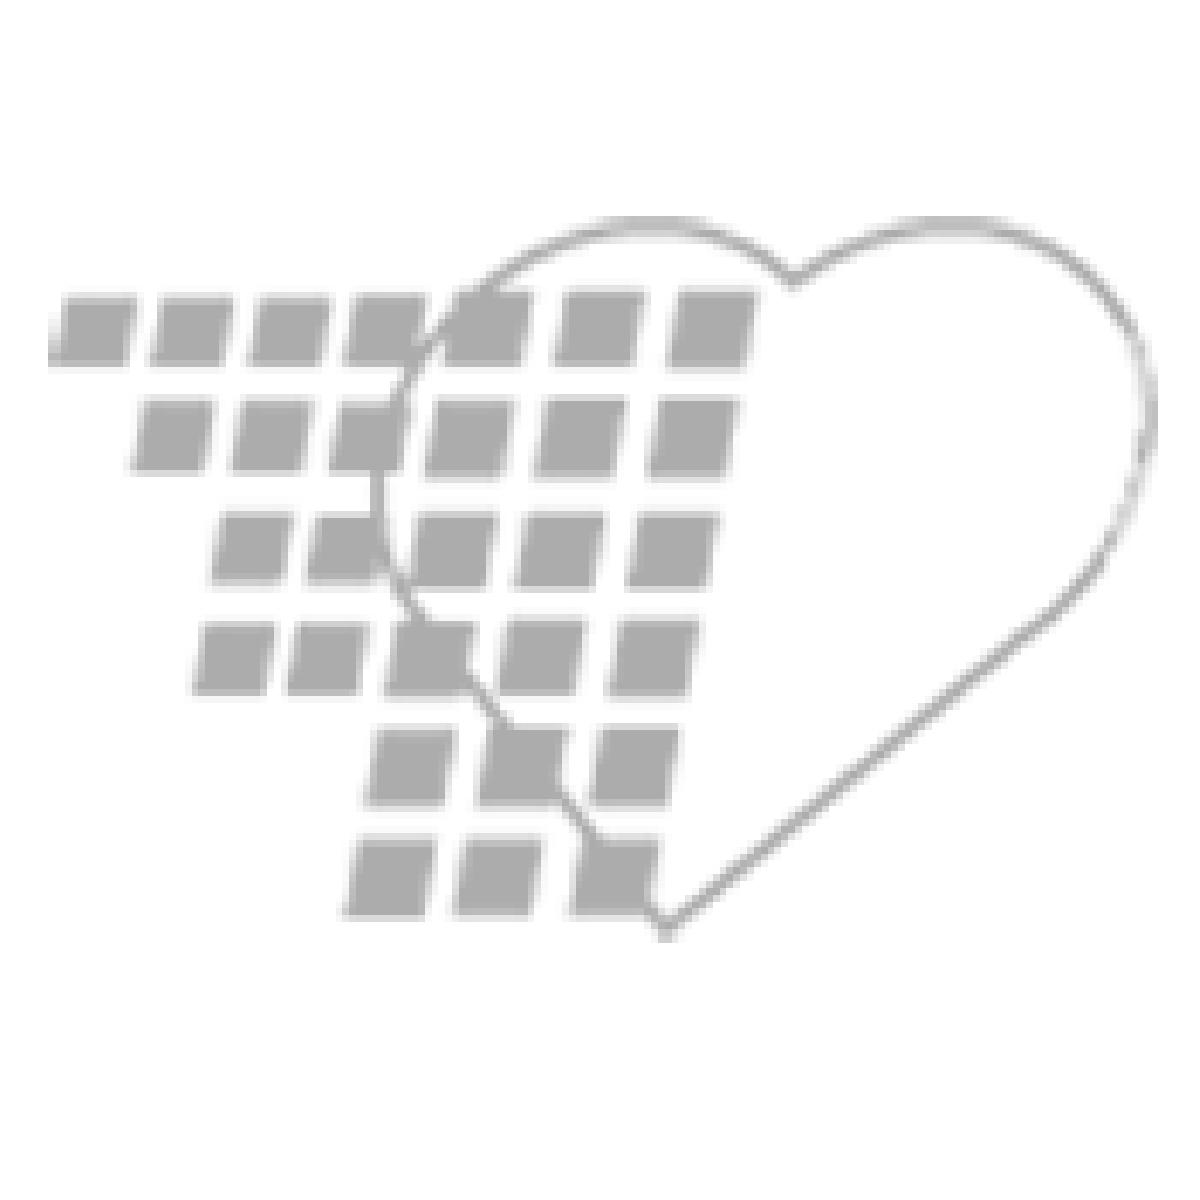 05-44-9800-REG - Laerdal Stifneck® Extrication Collar - Regular